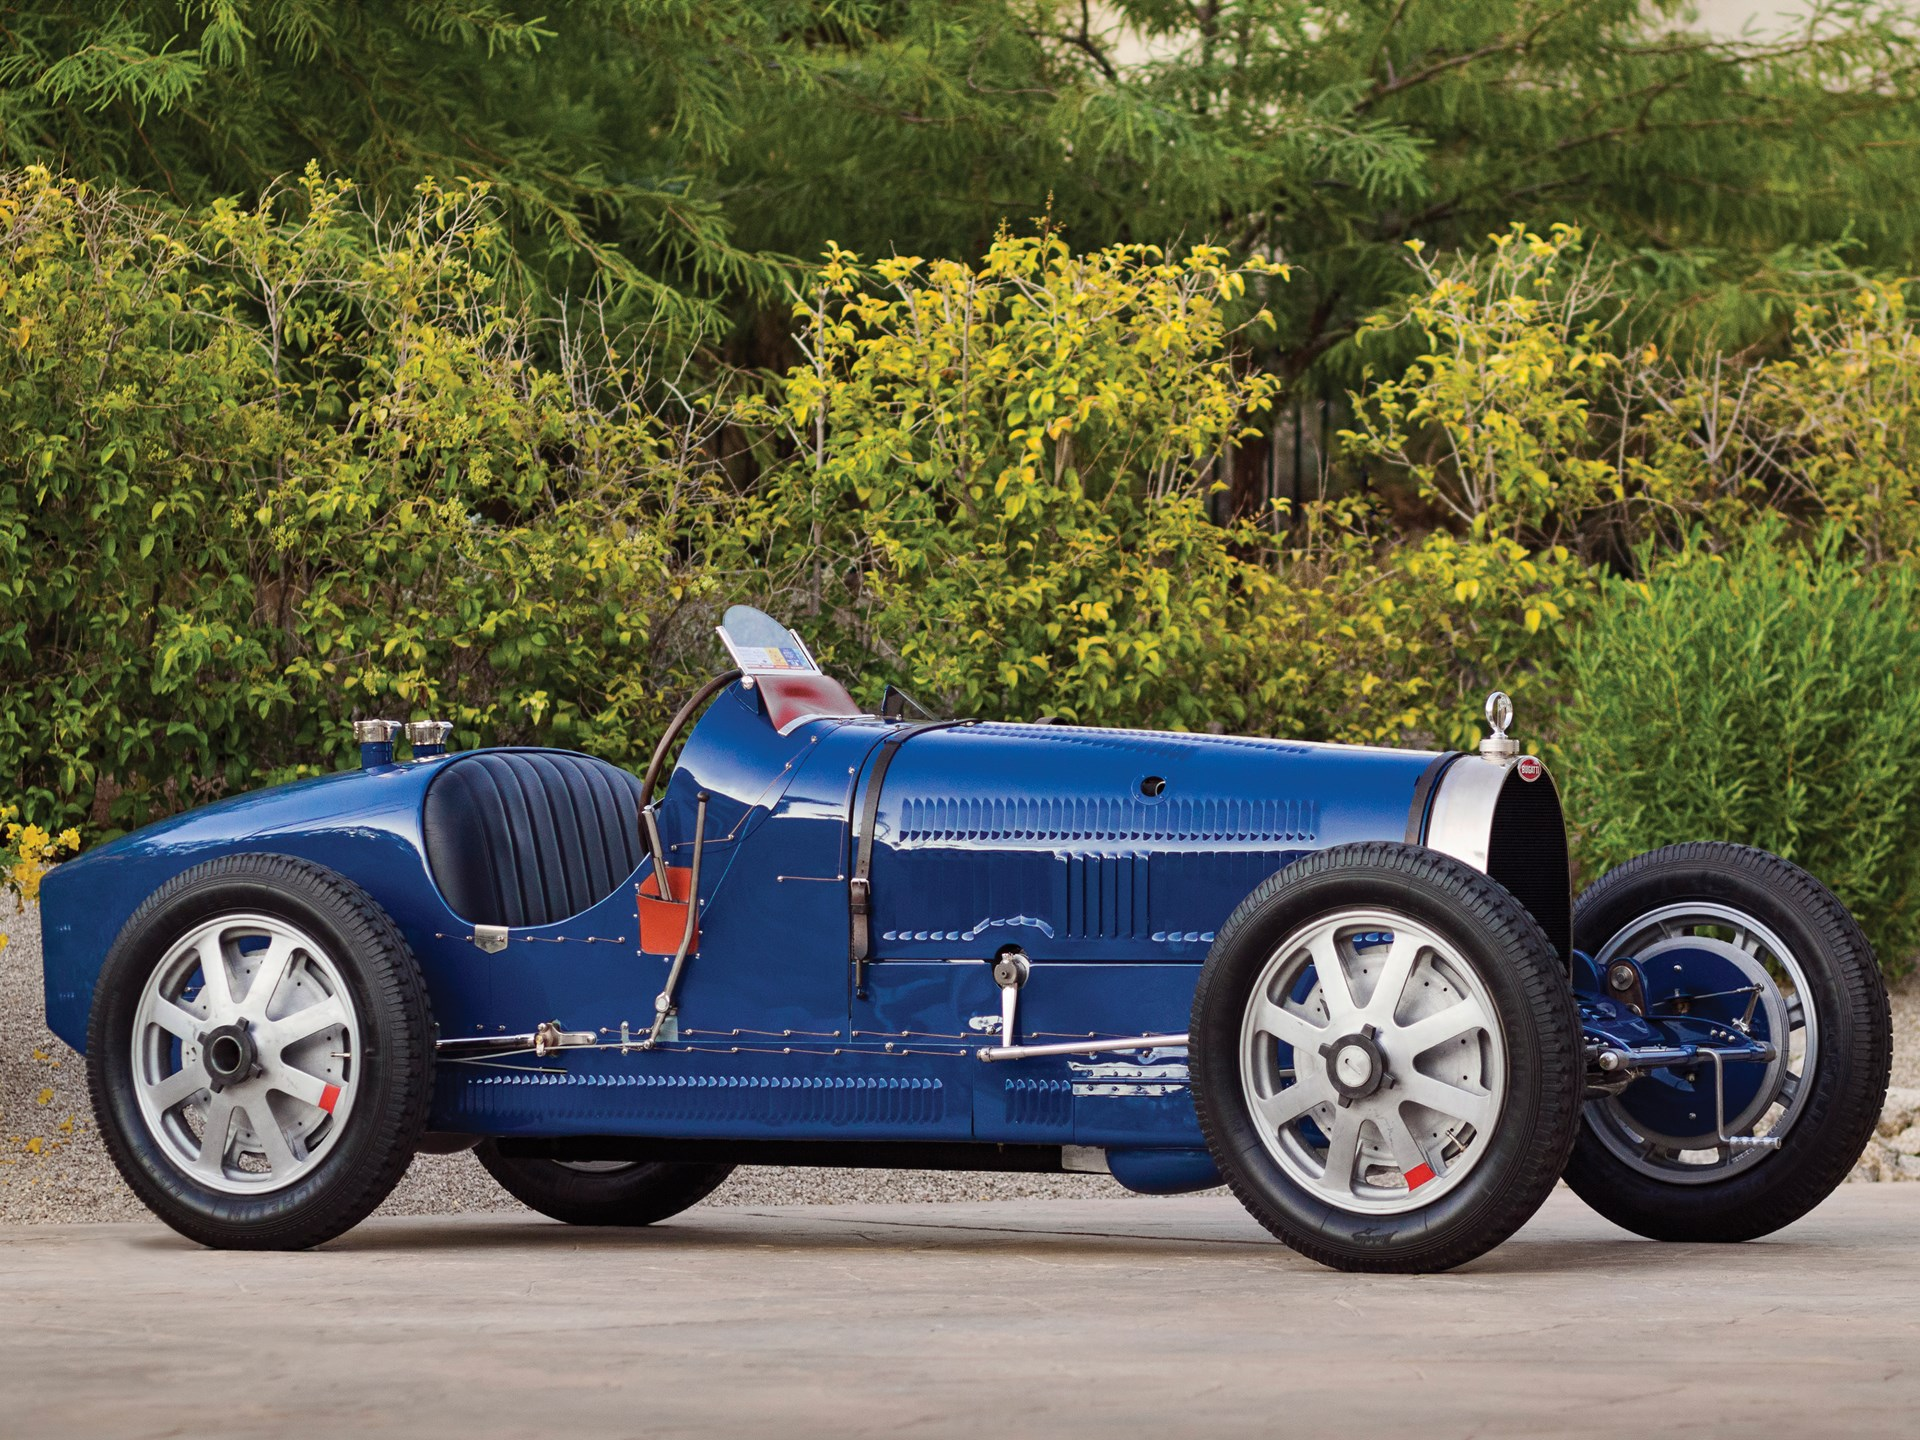 rm sotheby's - 1930 bugatti type 35b grand prix   arizona 2014